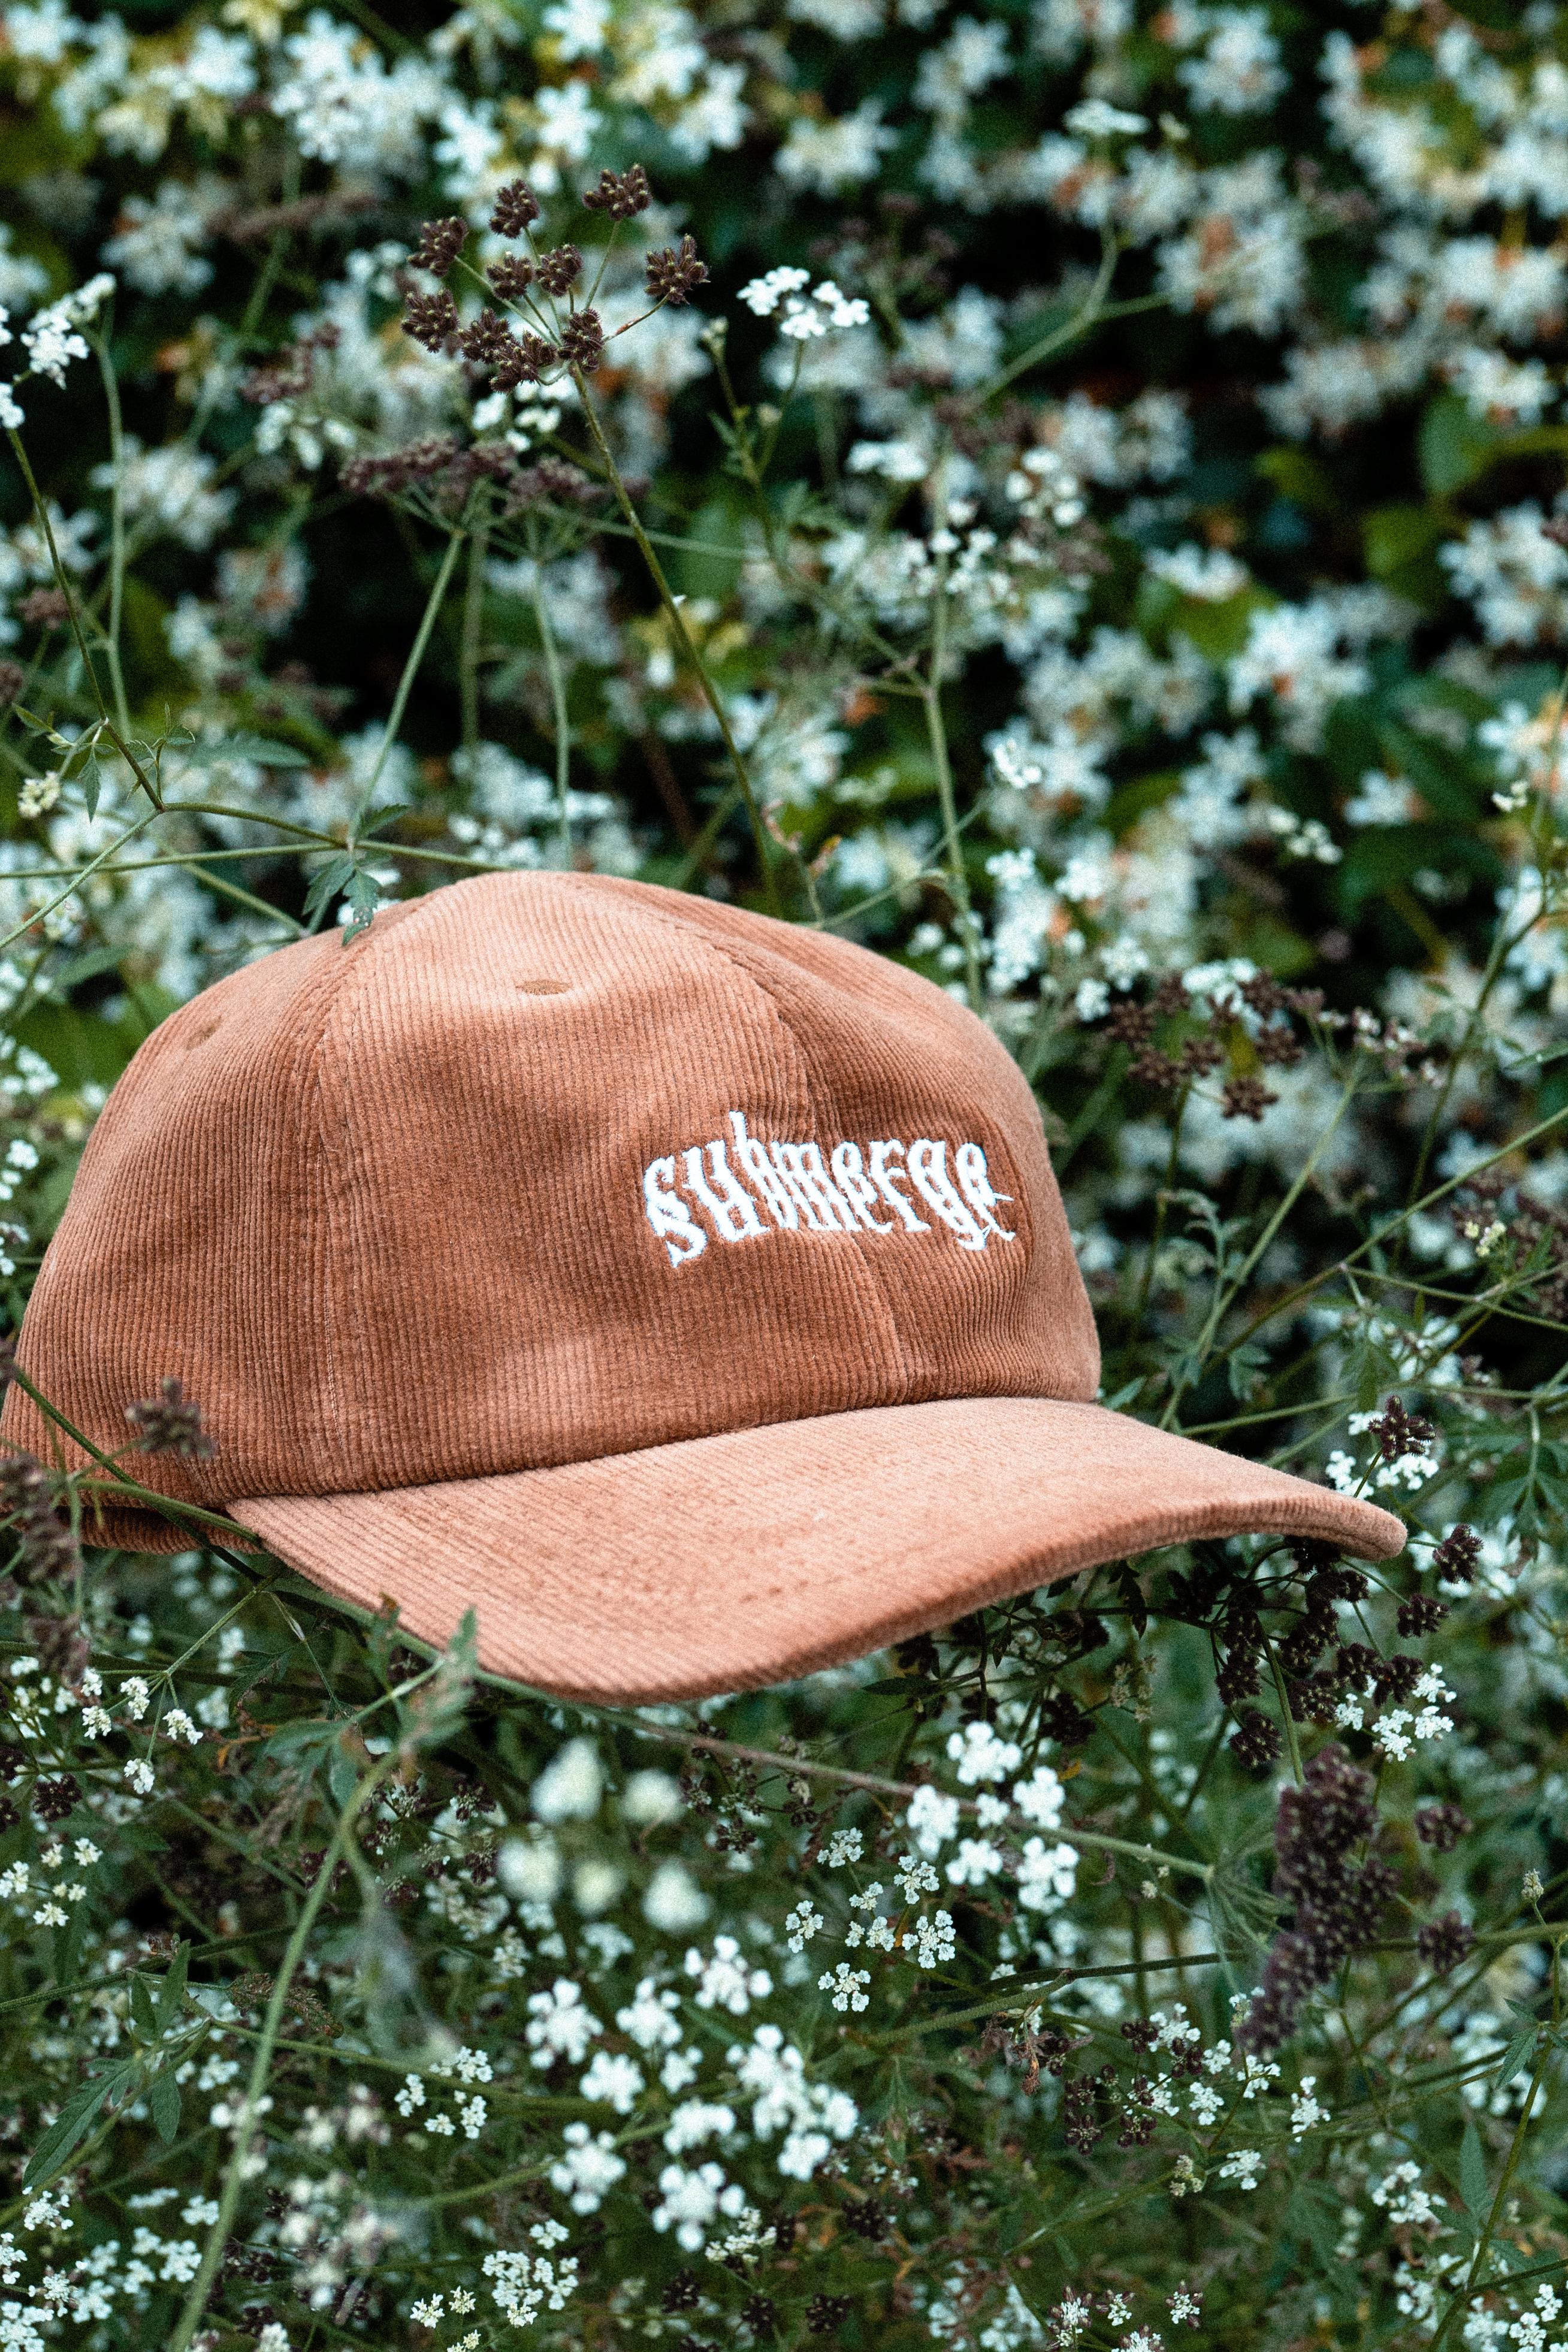 Submerge Hat